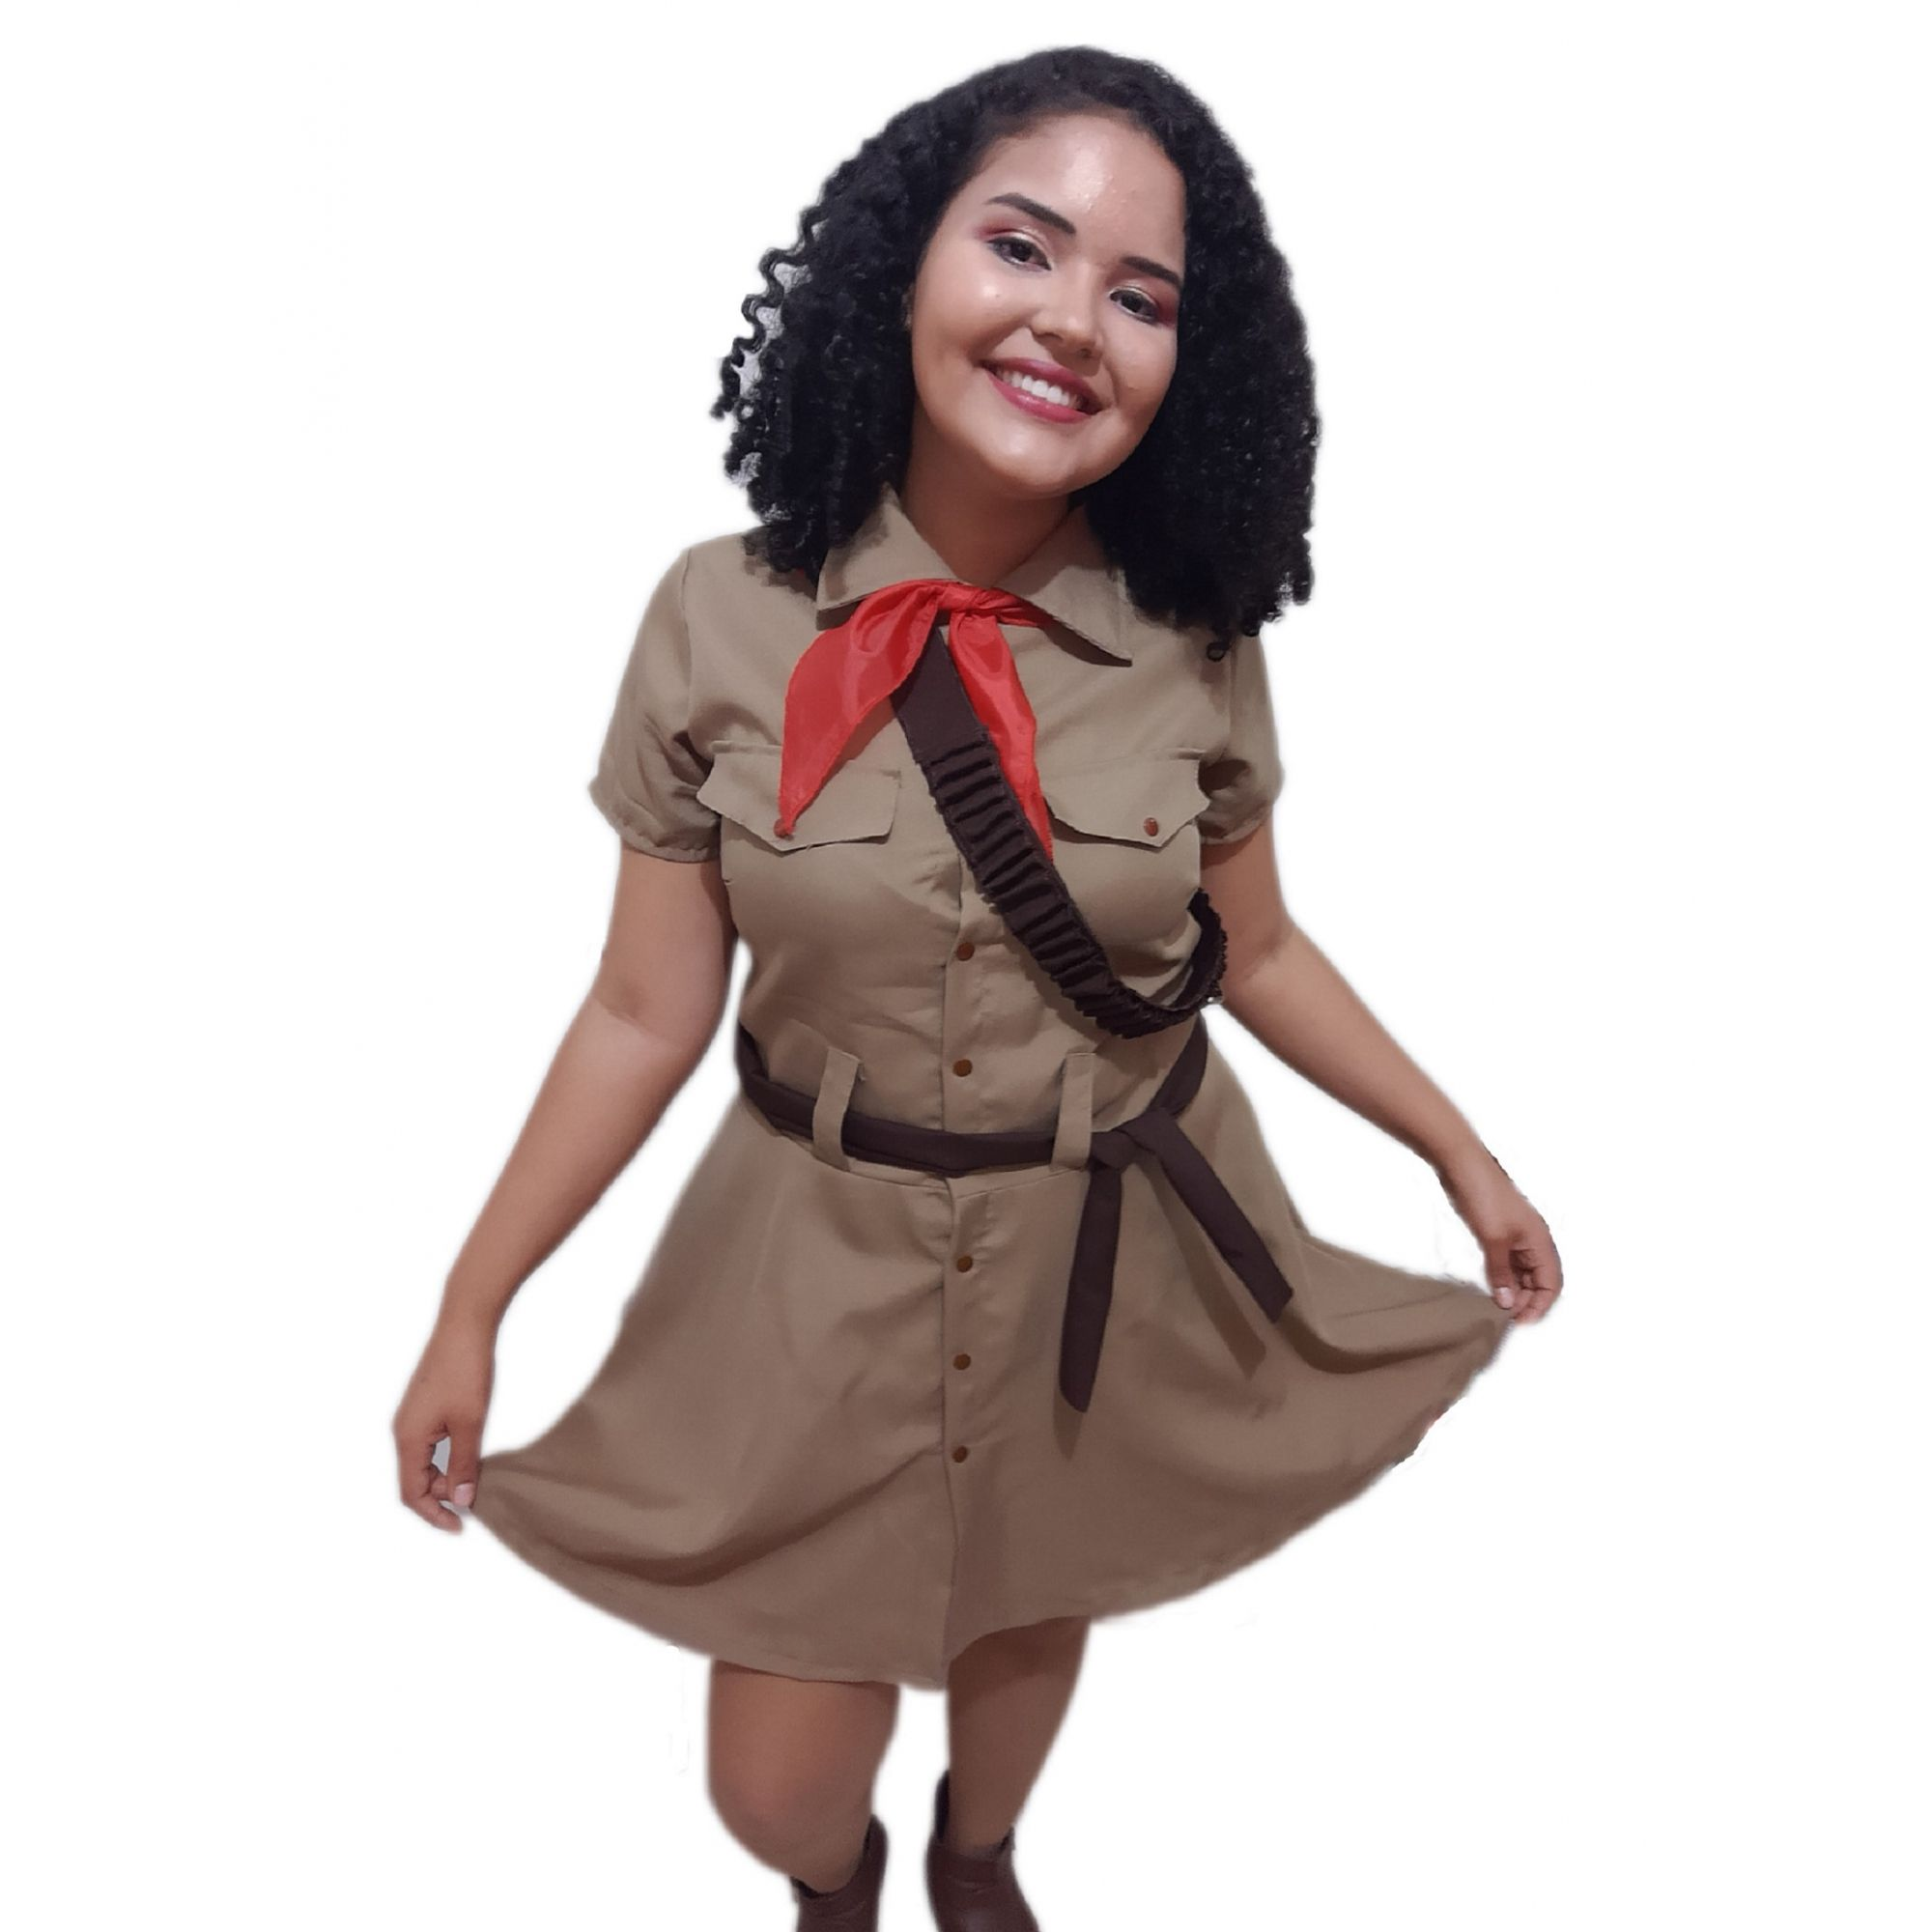 Fantasia Cangaceira Vestido com Chapéu Adulto